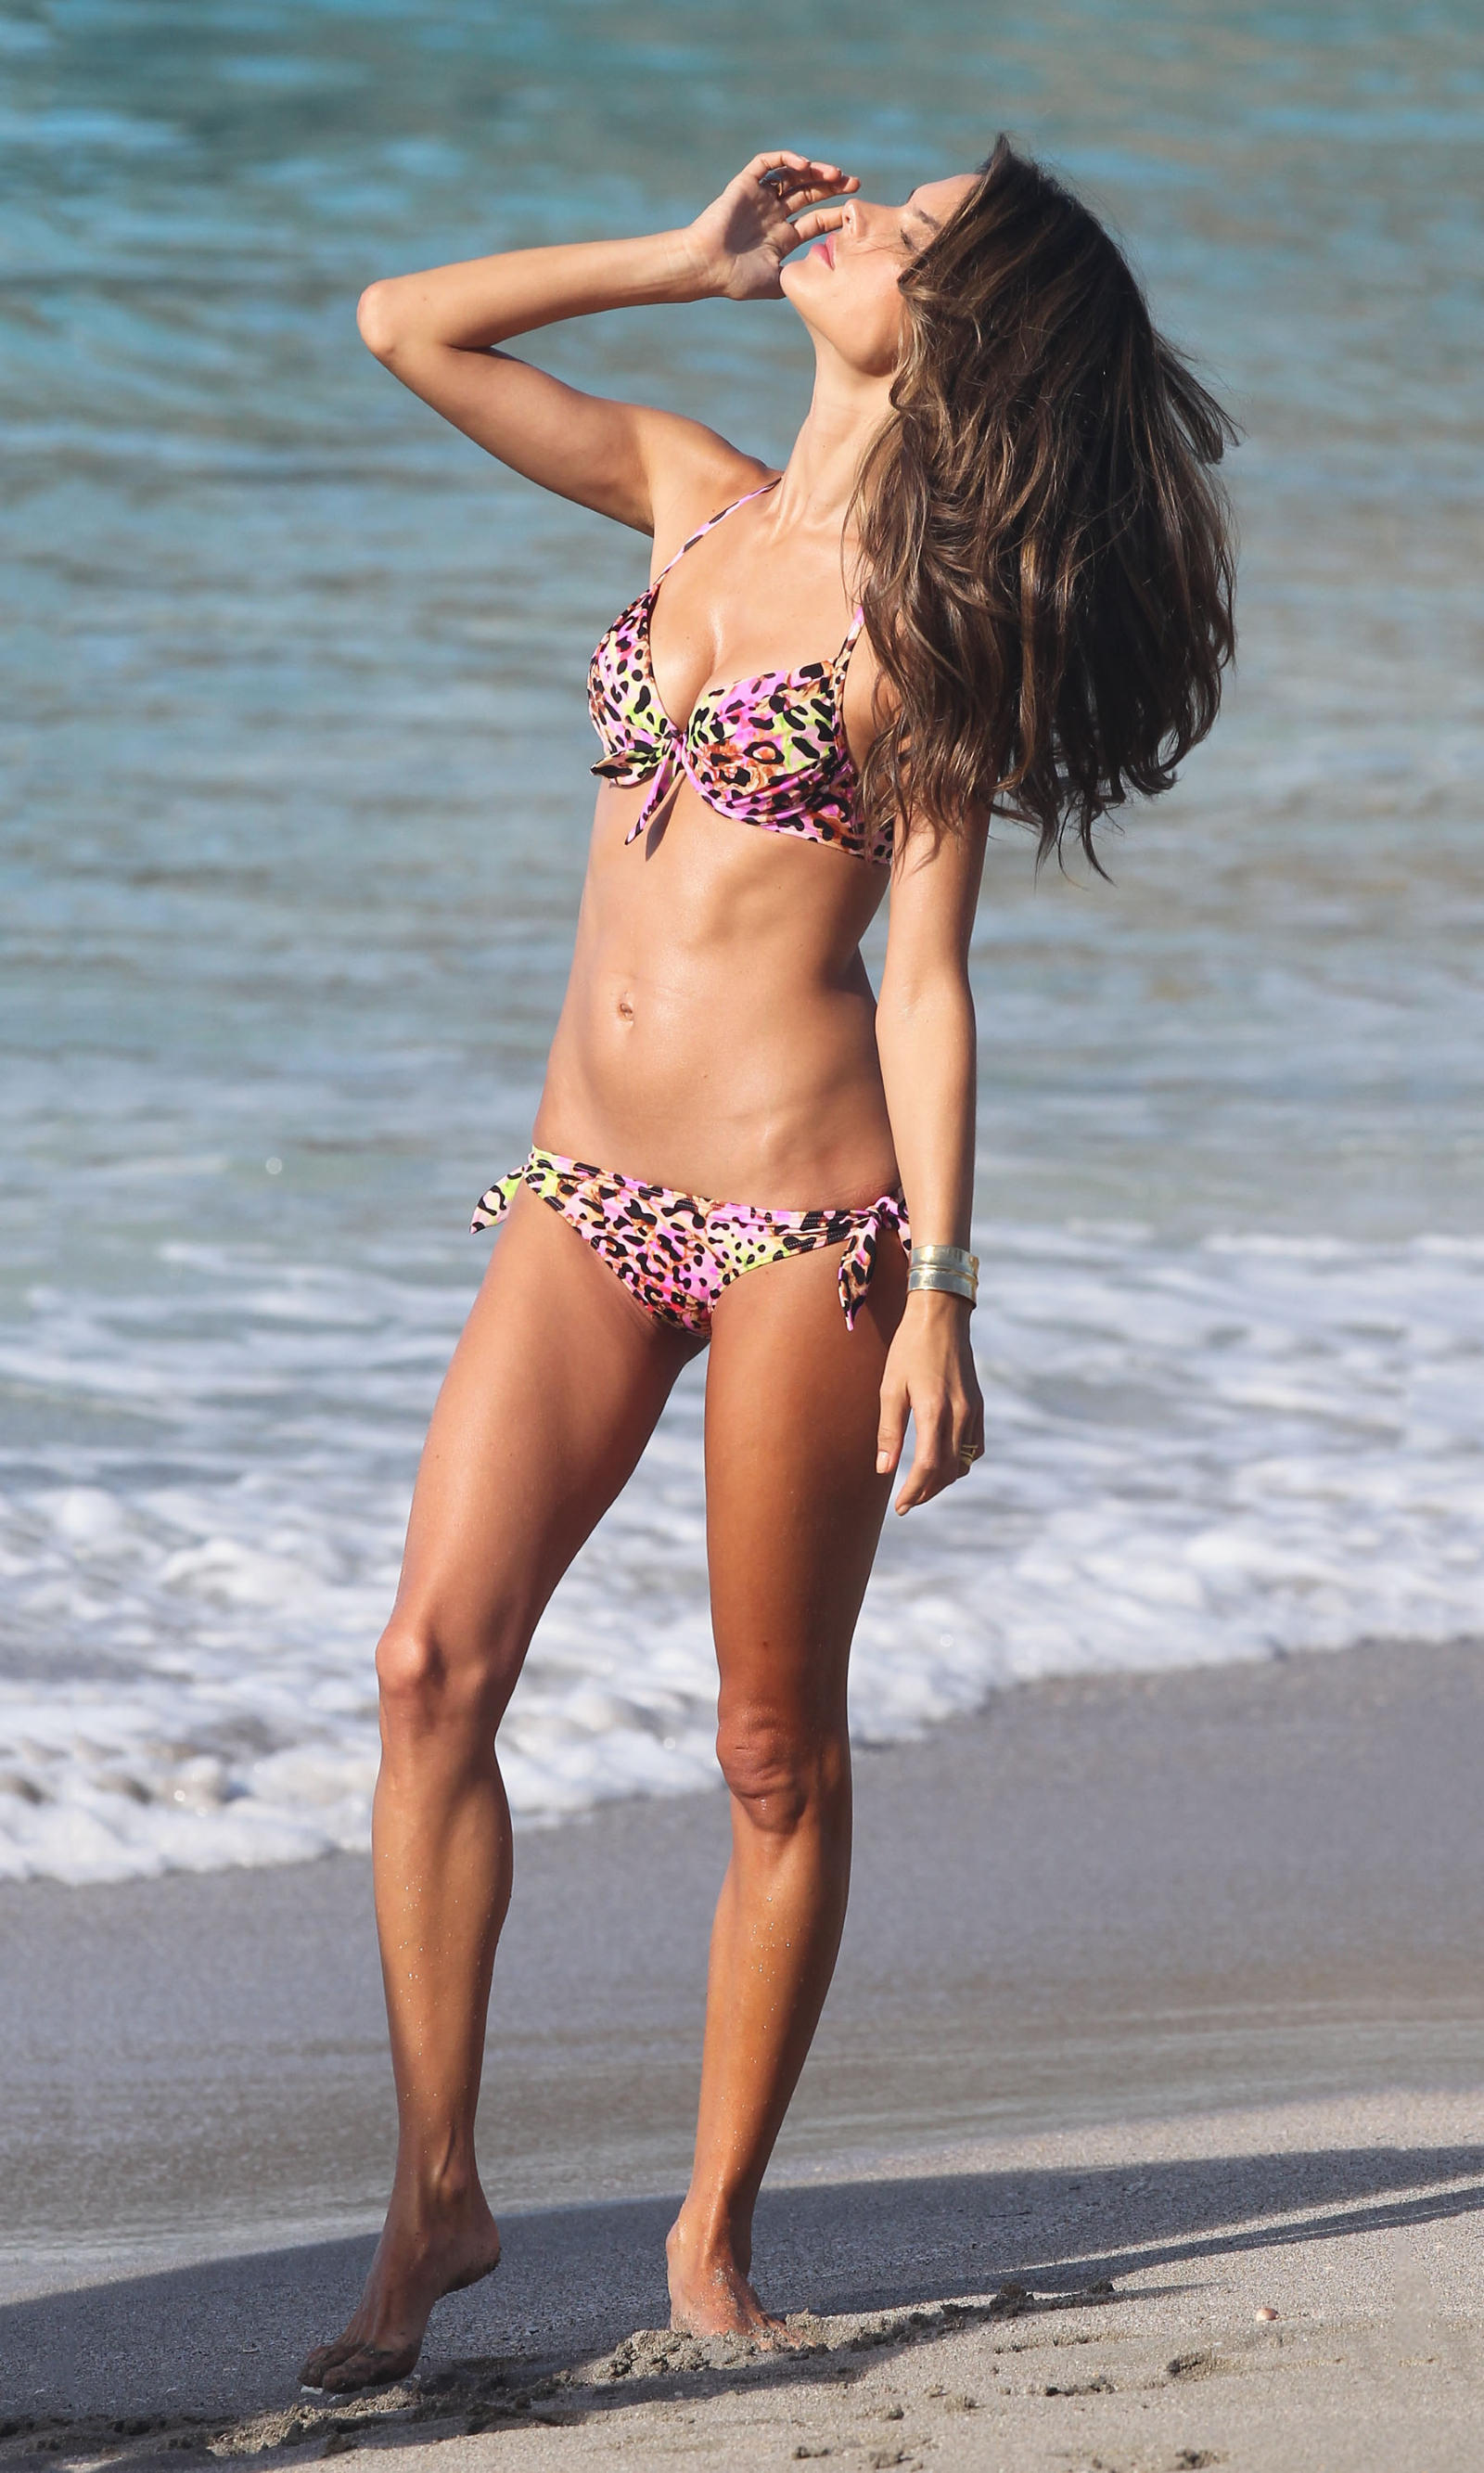 Alessandra Ambrosio Bikini Bodies Pic 21 of 35